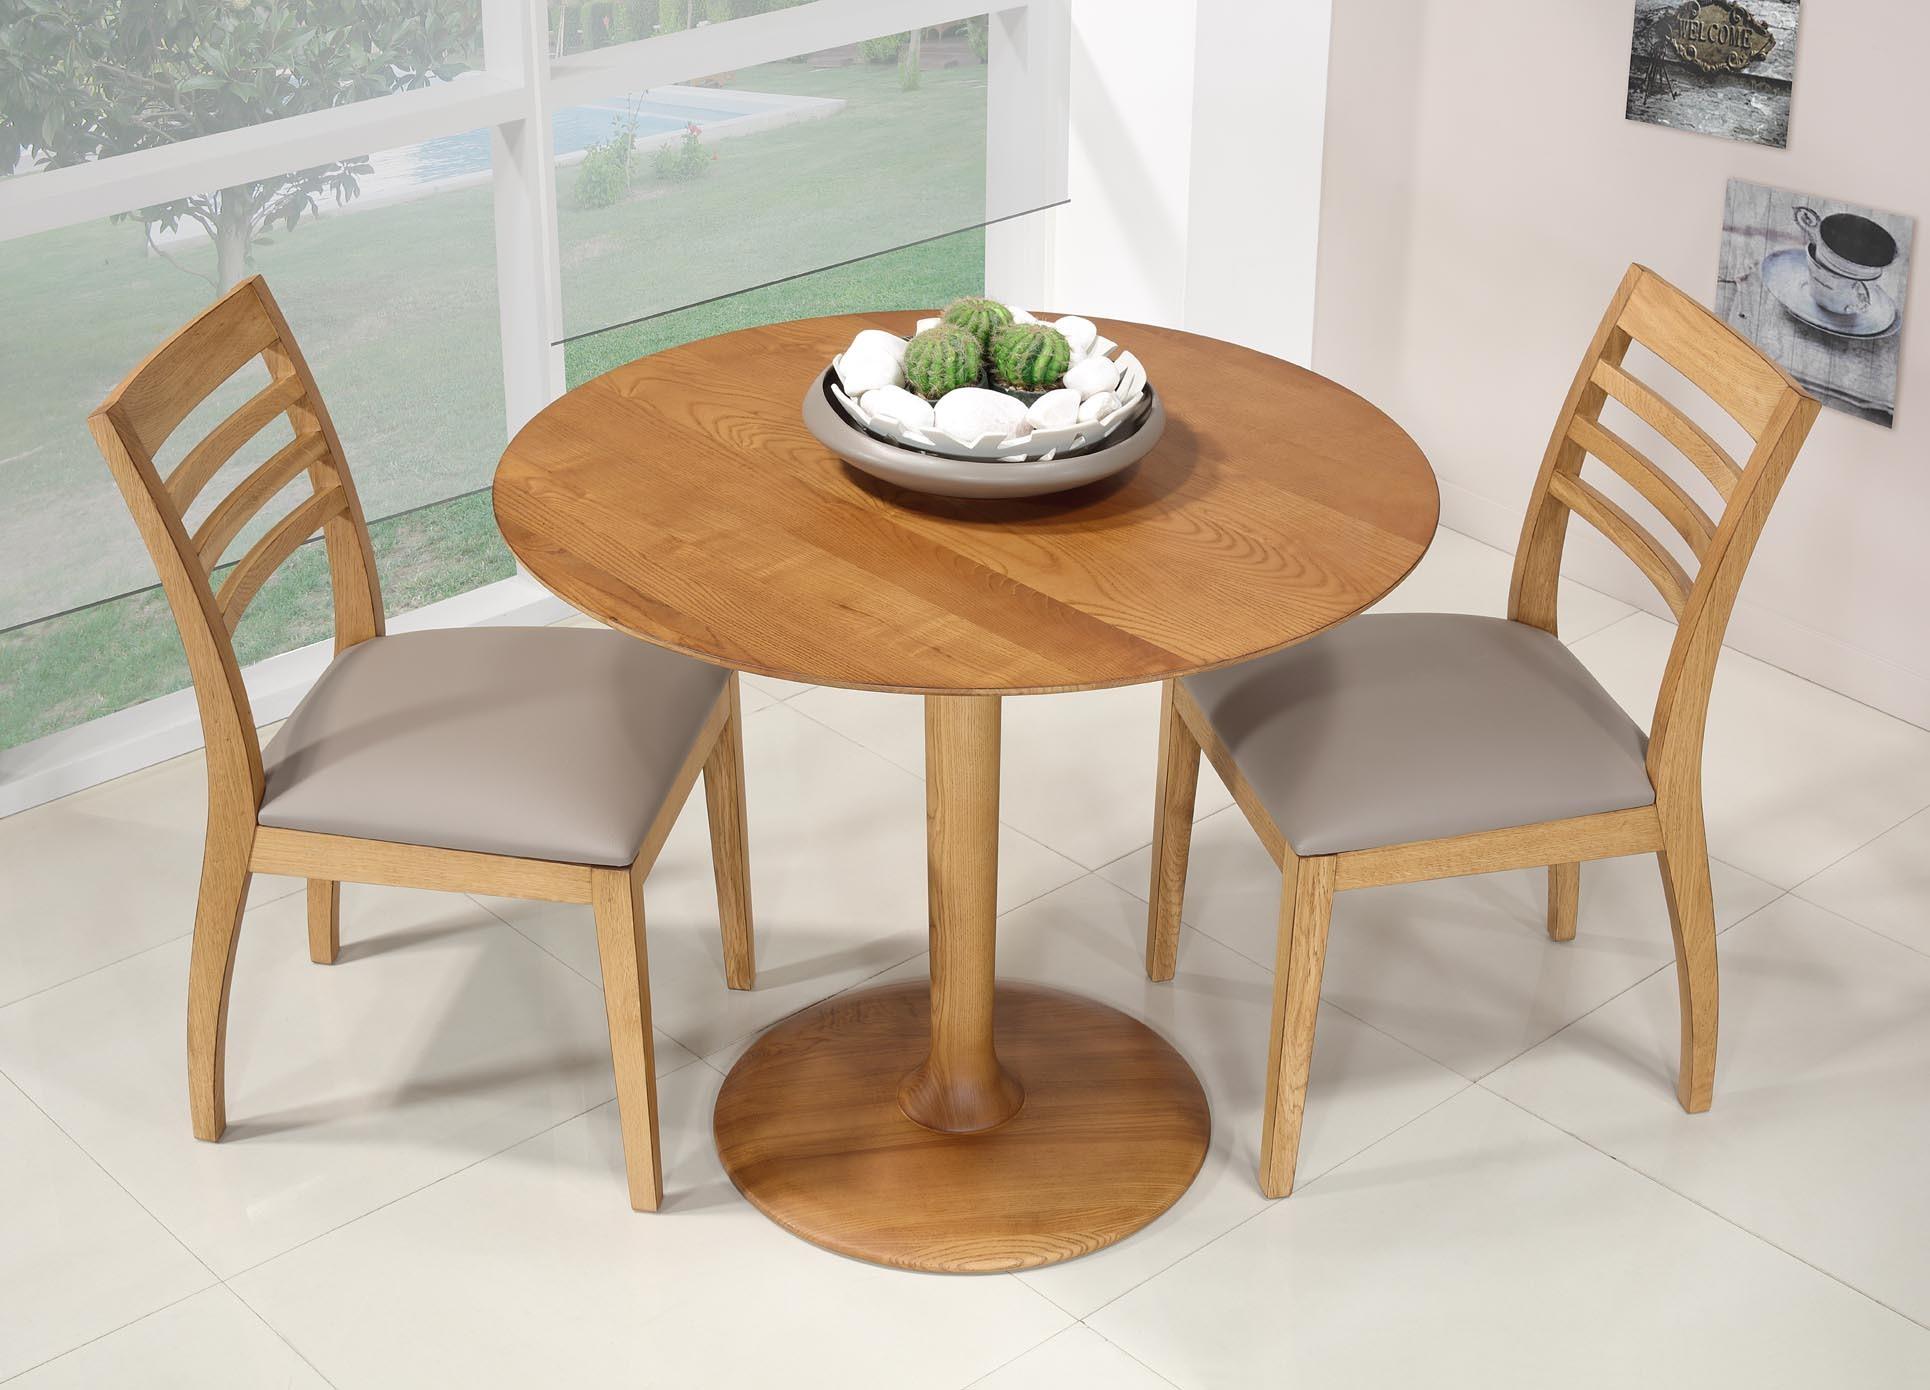 Petite Table Ronde Pieds Central Realisee En Frene Massif Diametre